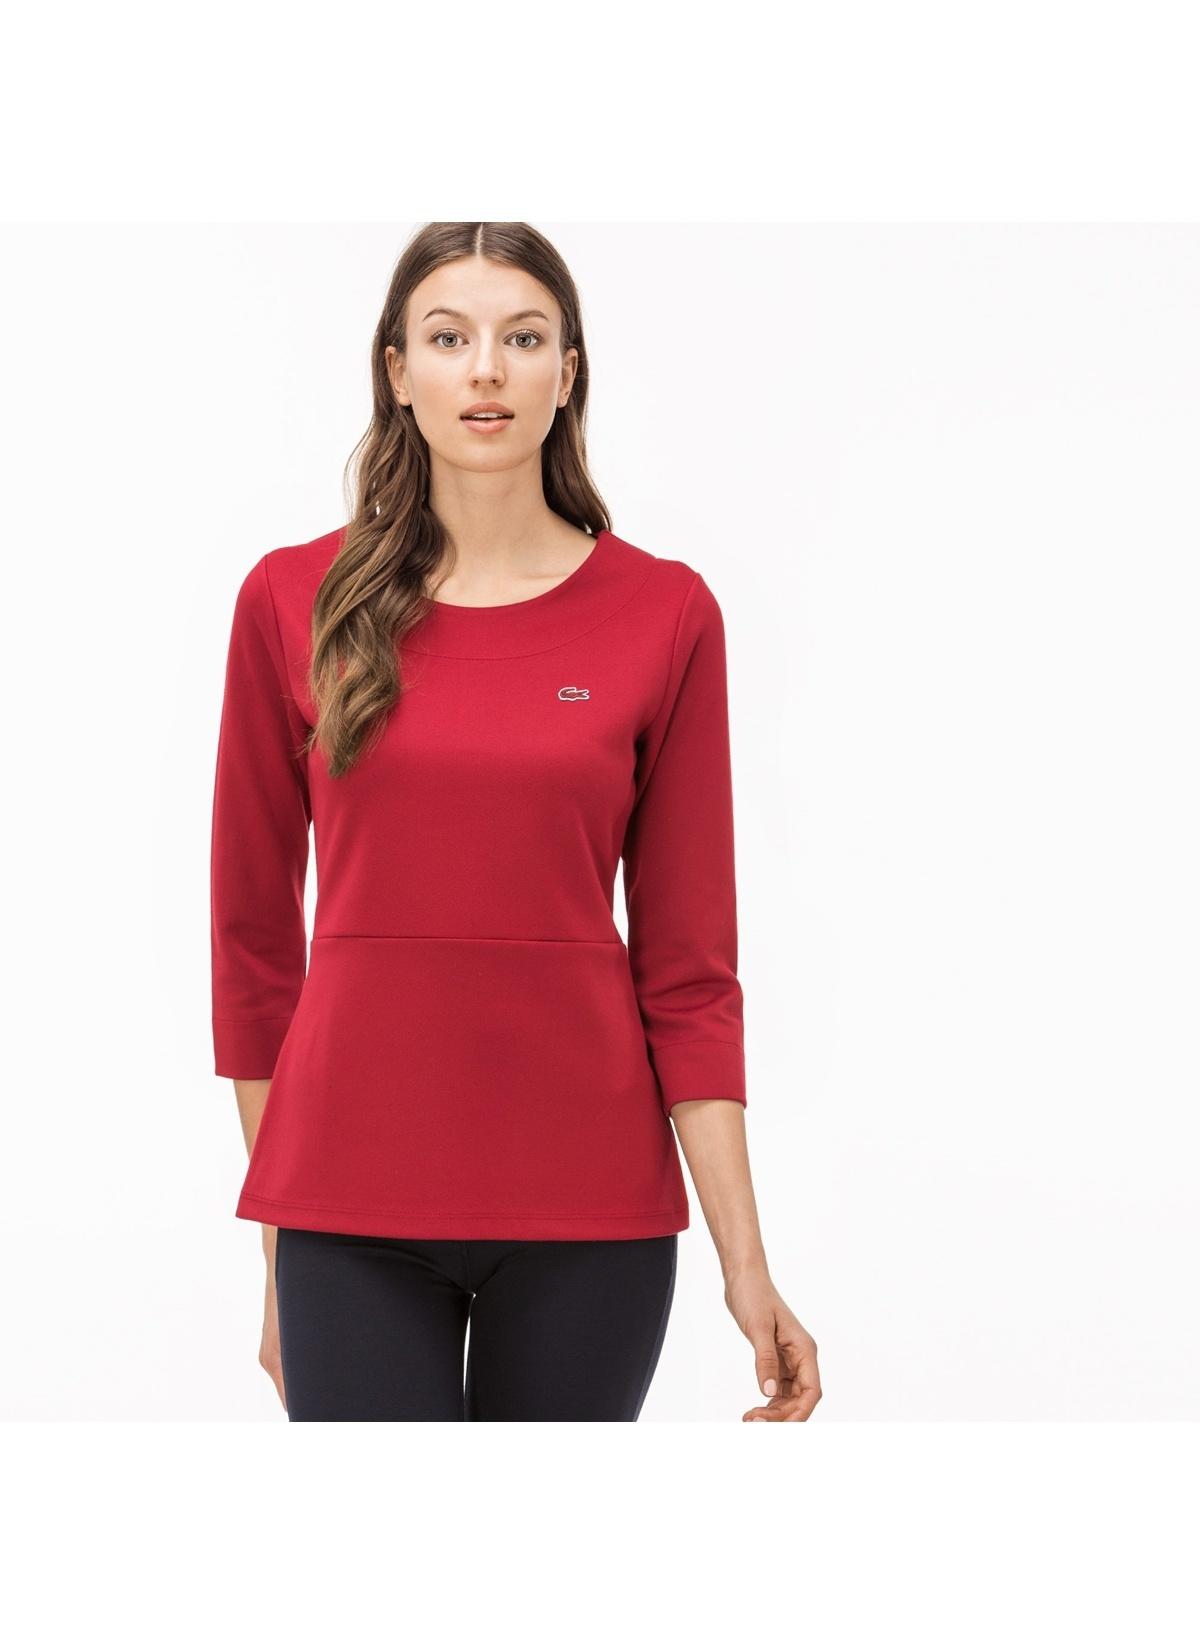 Lacoste Tişört Tf1904.04r T-shirt – 322.0 TL